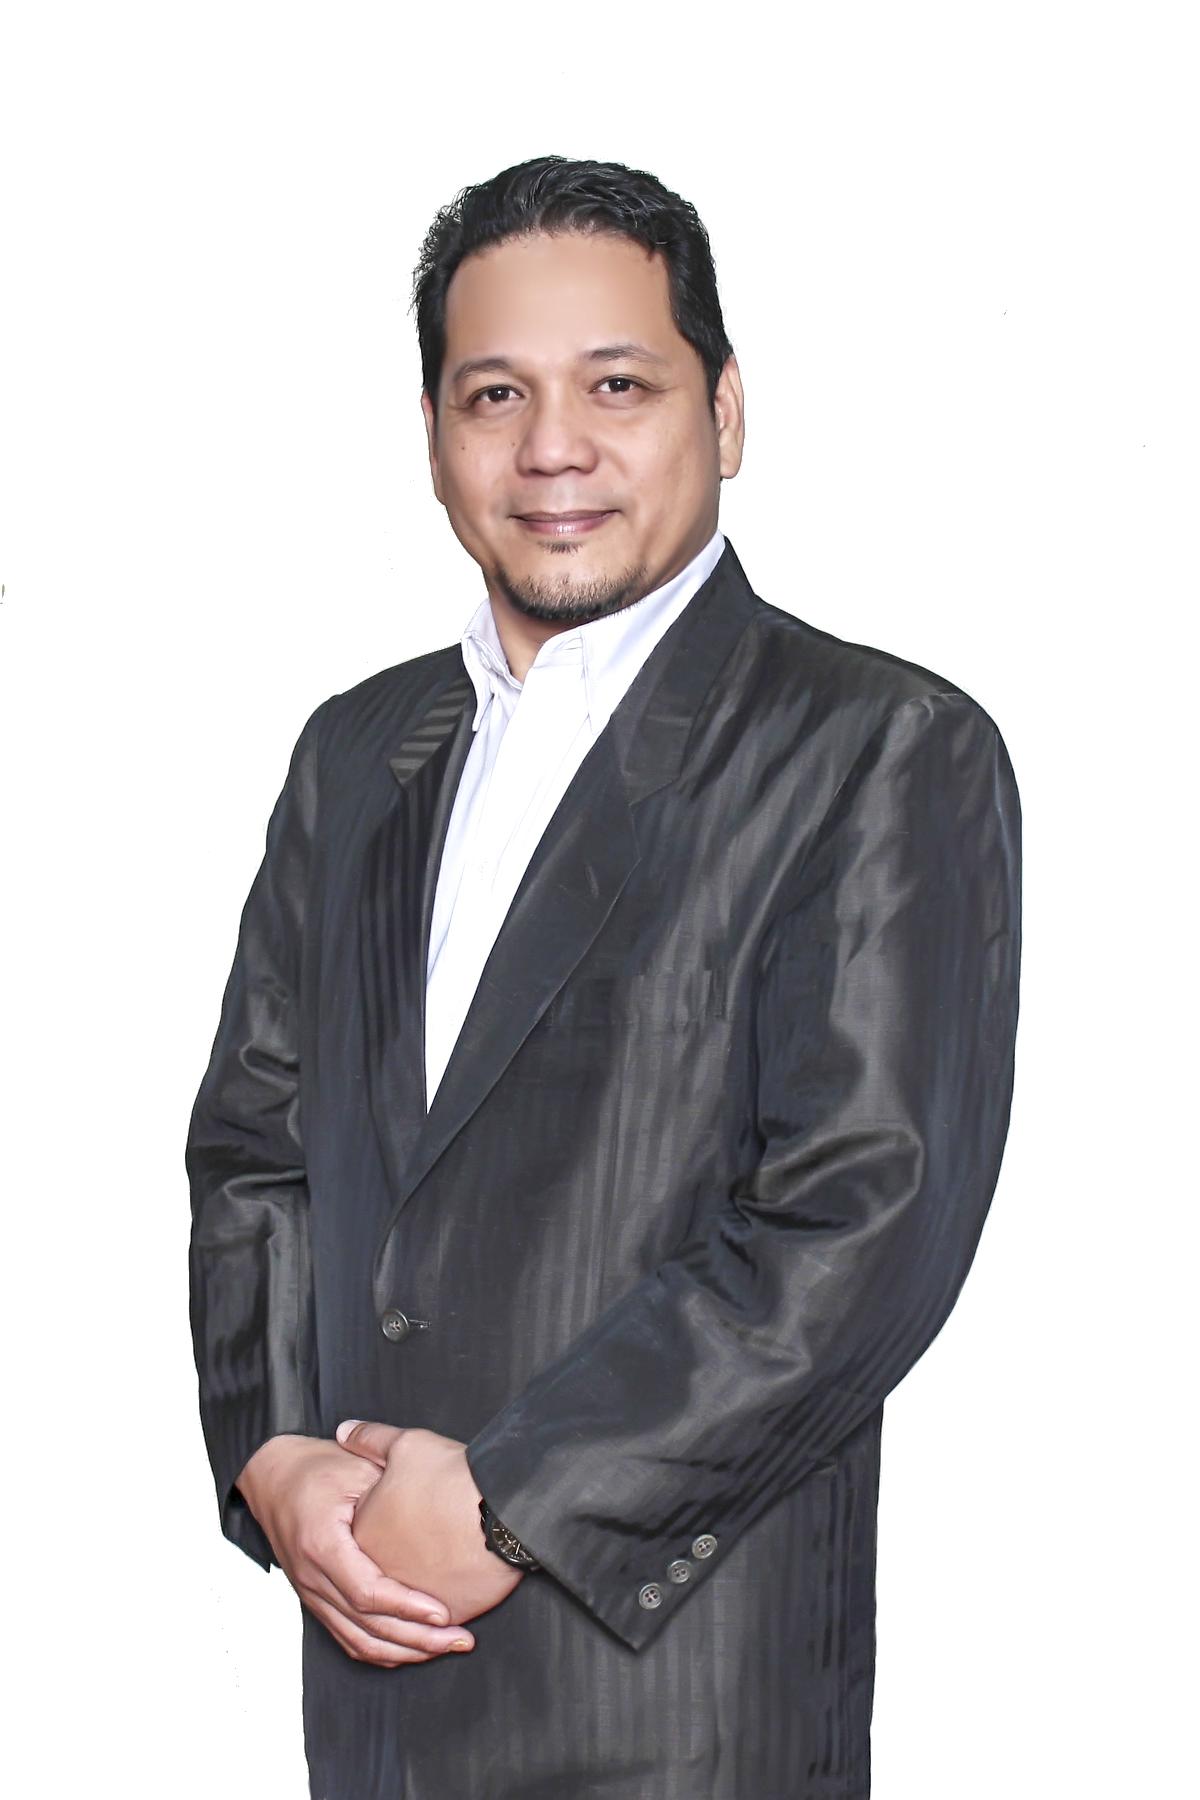 Fadzly Yusof